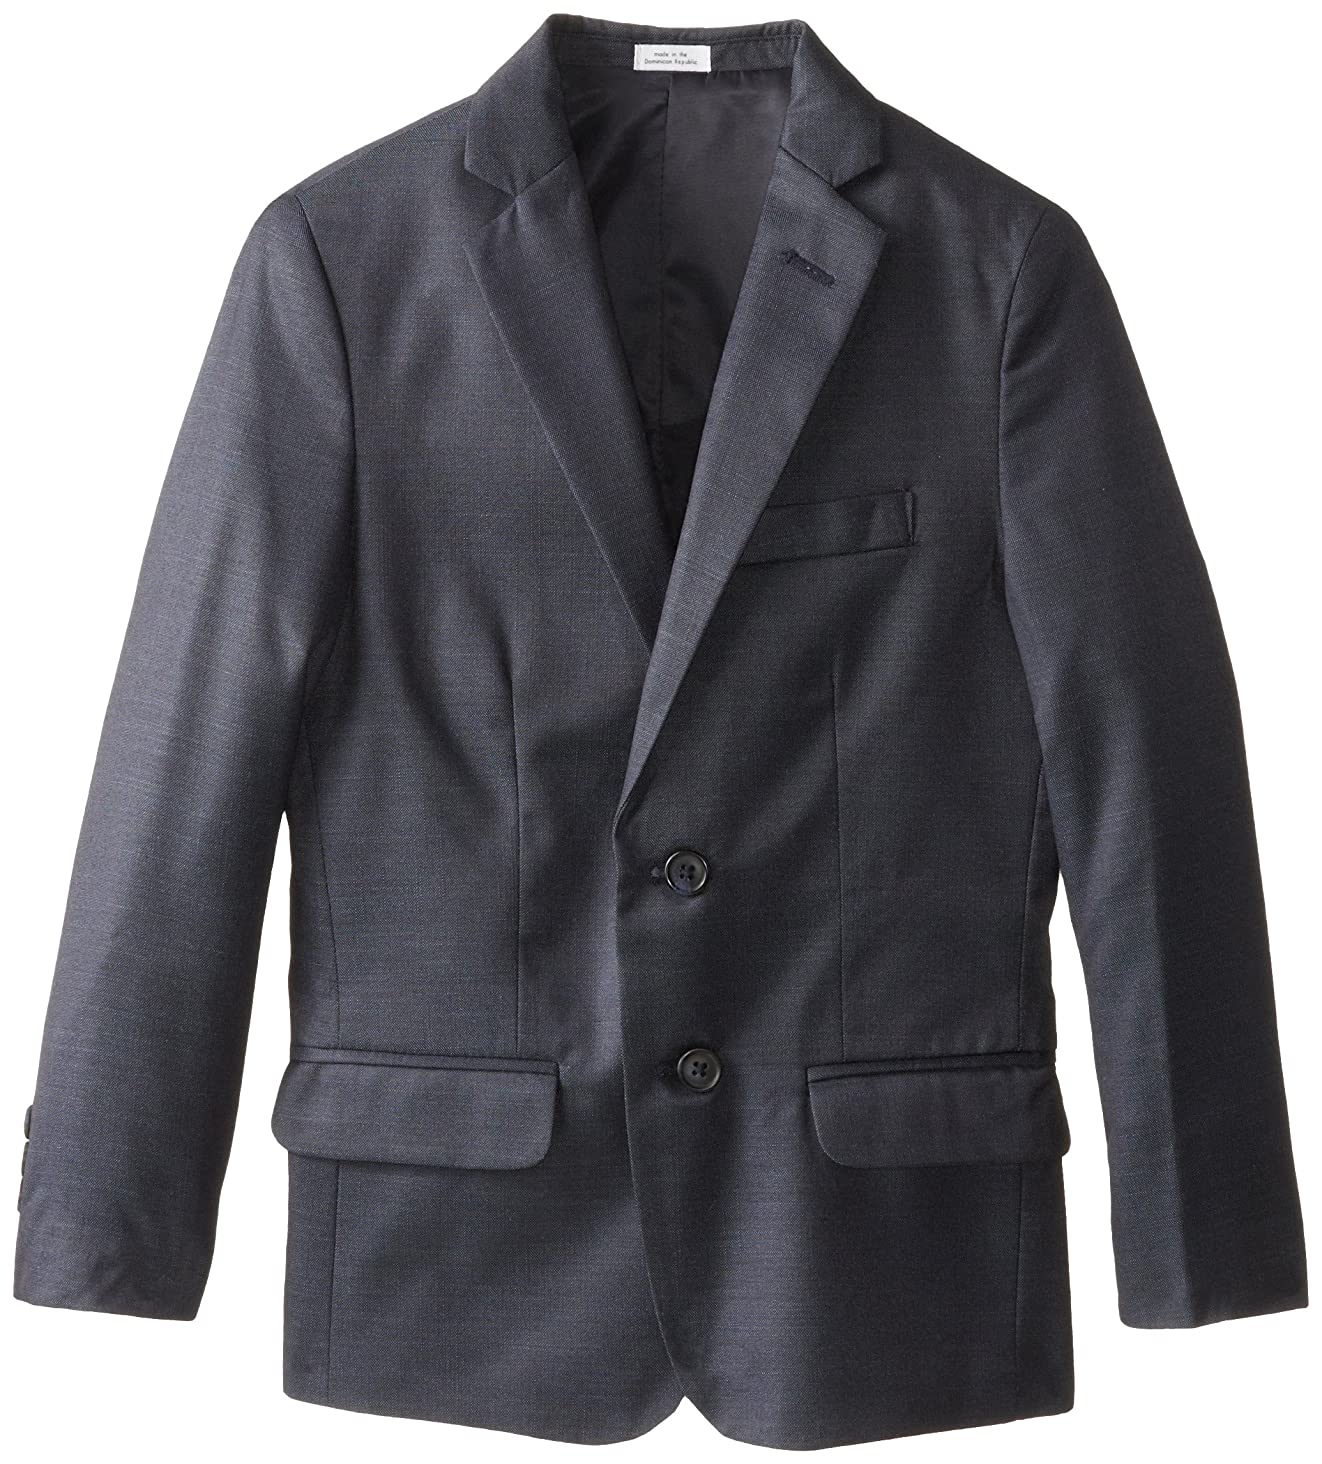 Calvin Klein Boys' Patterned Blazer Jacket